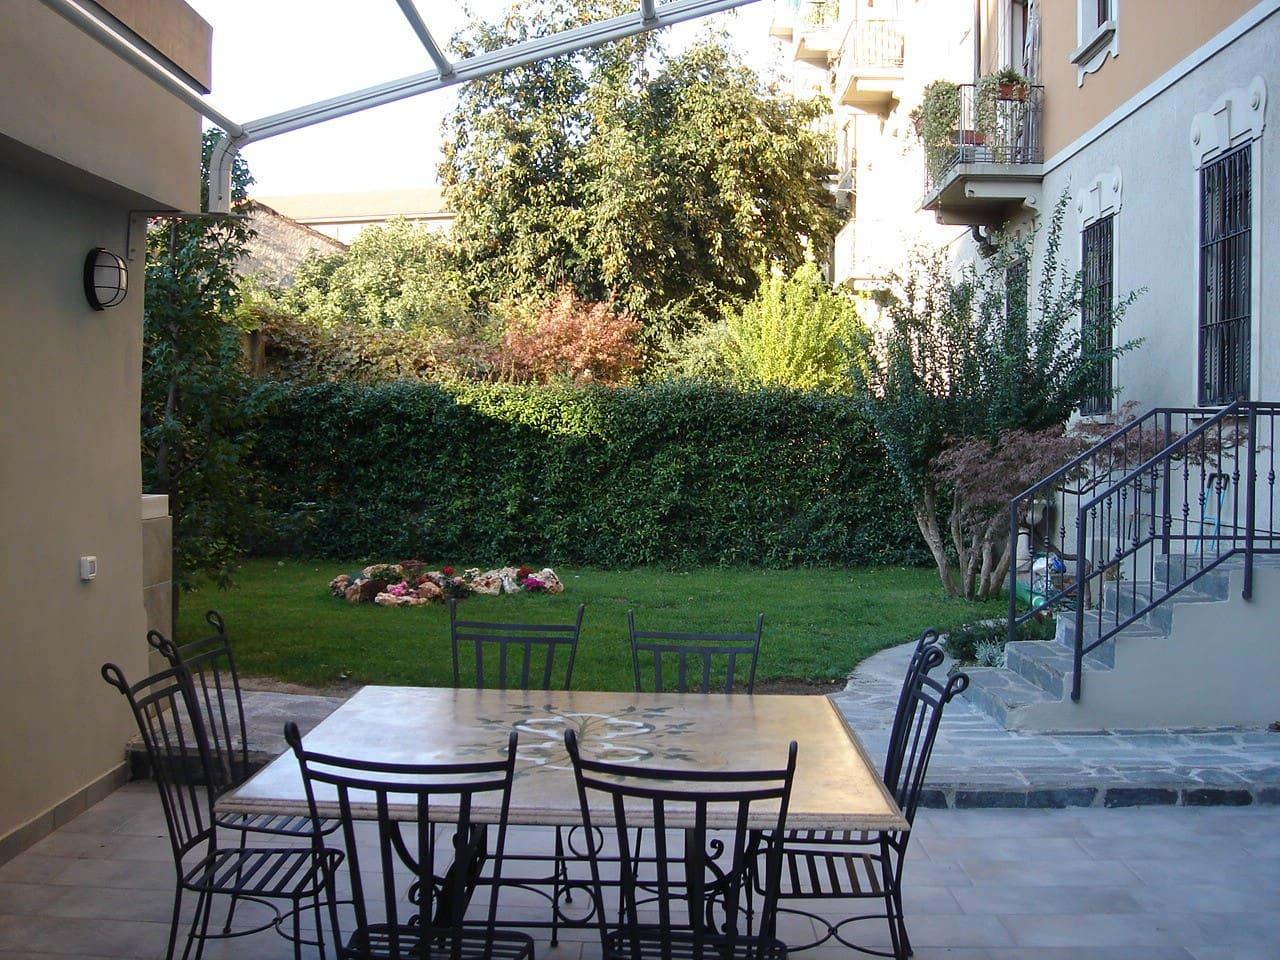 the garden - check for availability